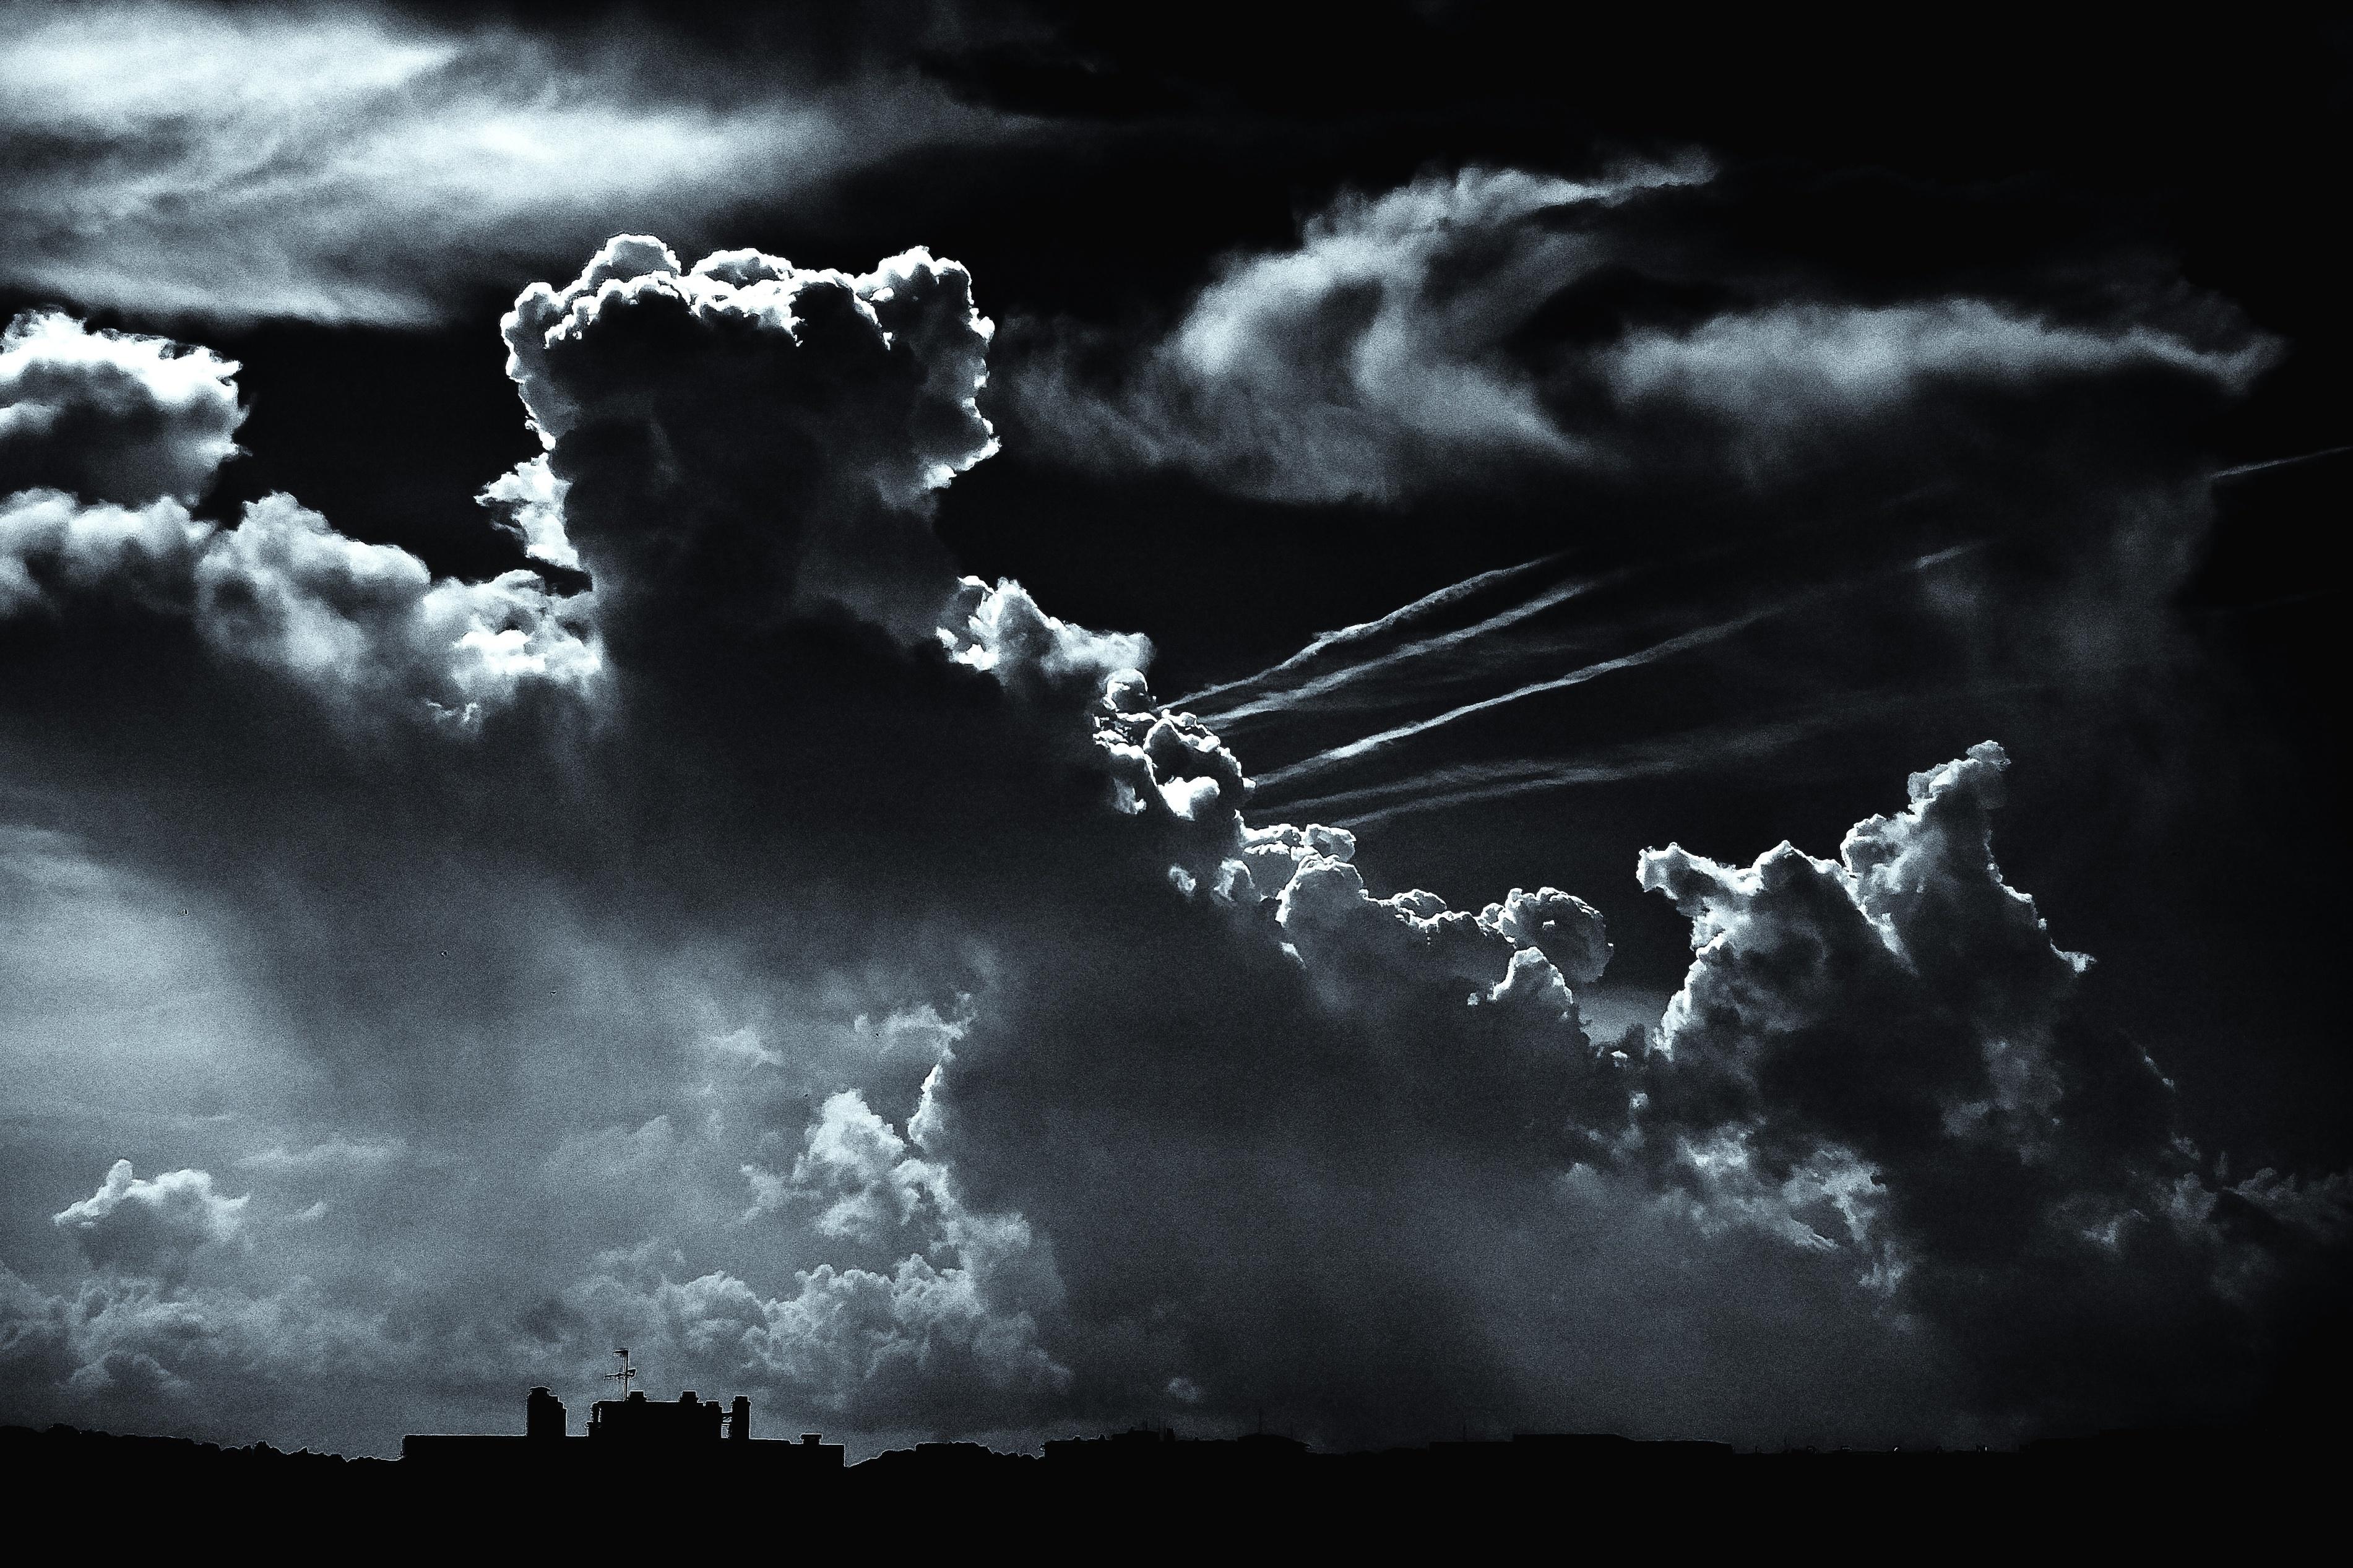 Dark Sky Wallpaper 3802x2534